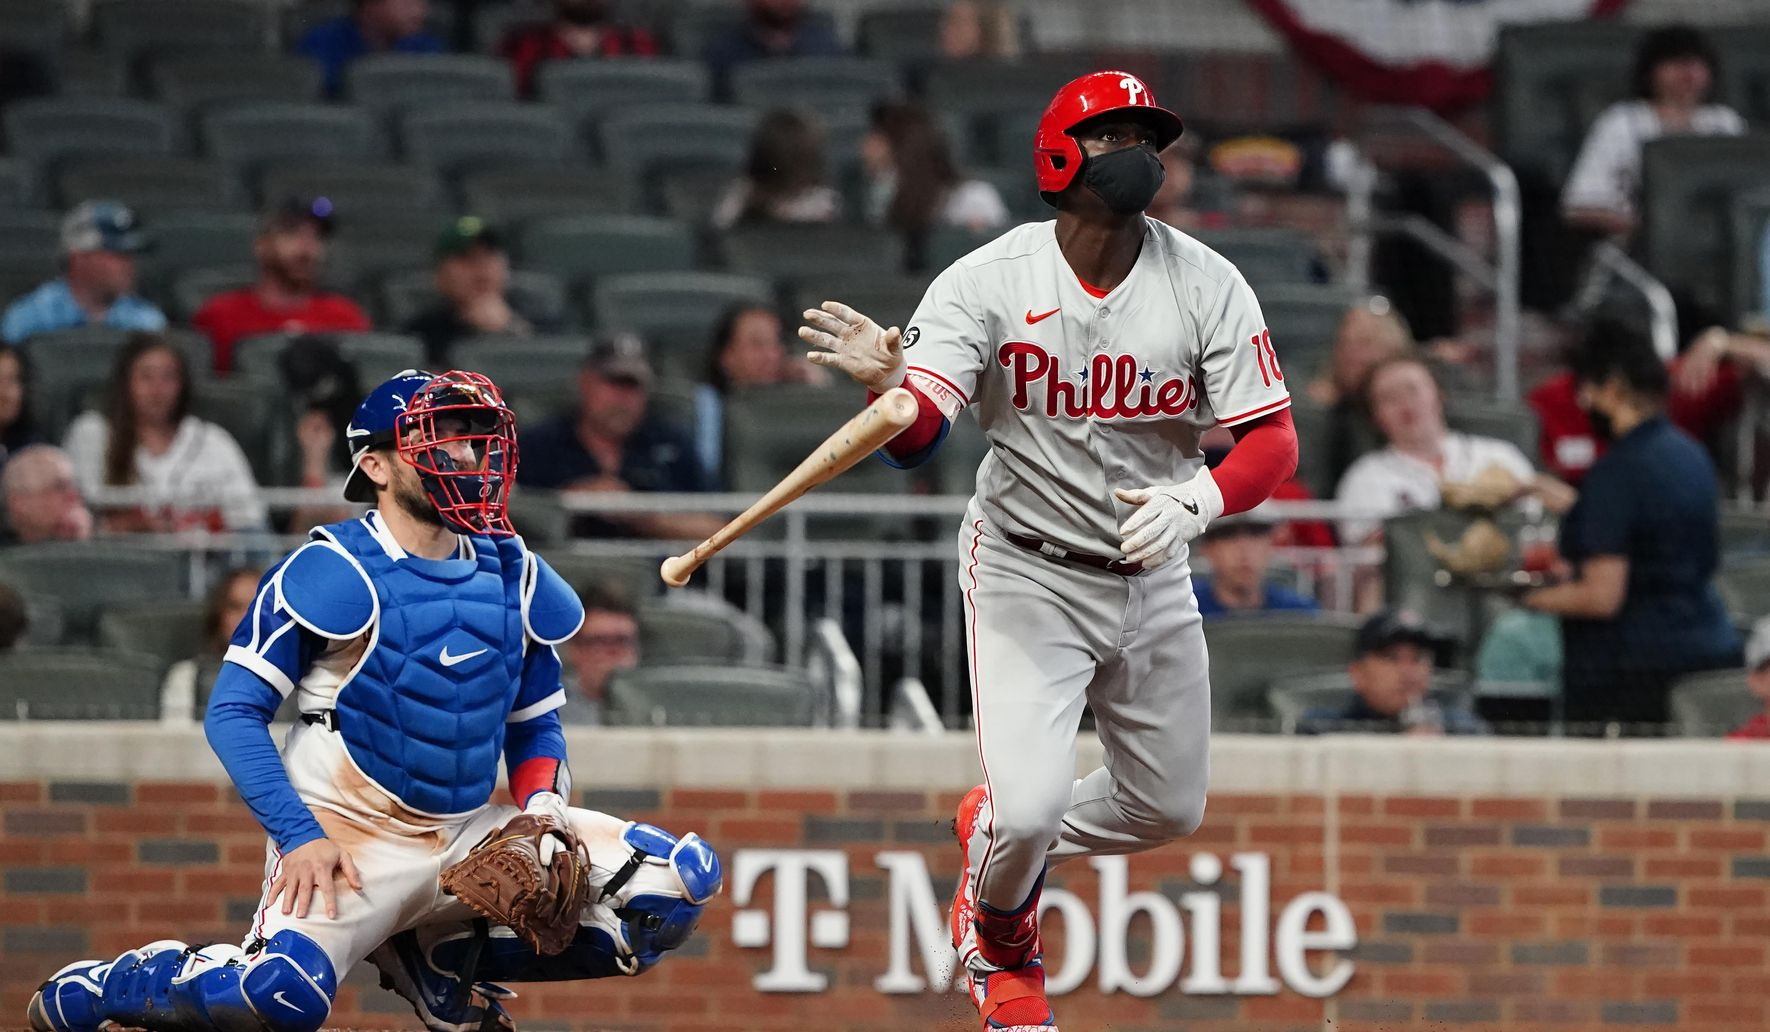 Phillies_braves_baseball_05234_c0-214-5110-3193_s1770x1032